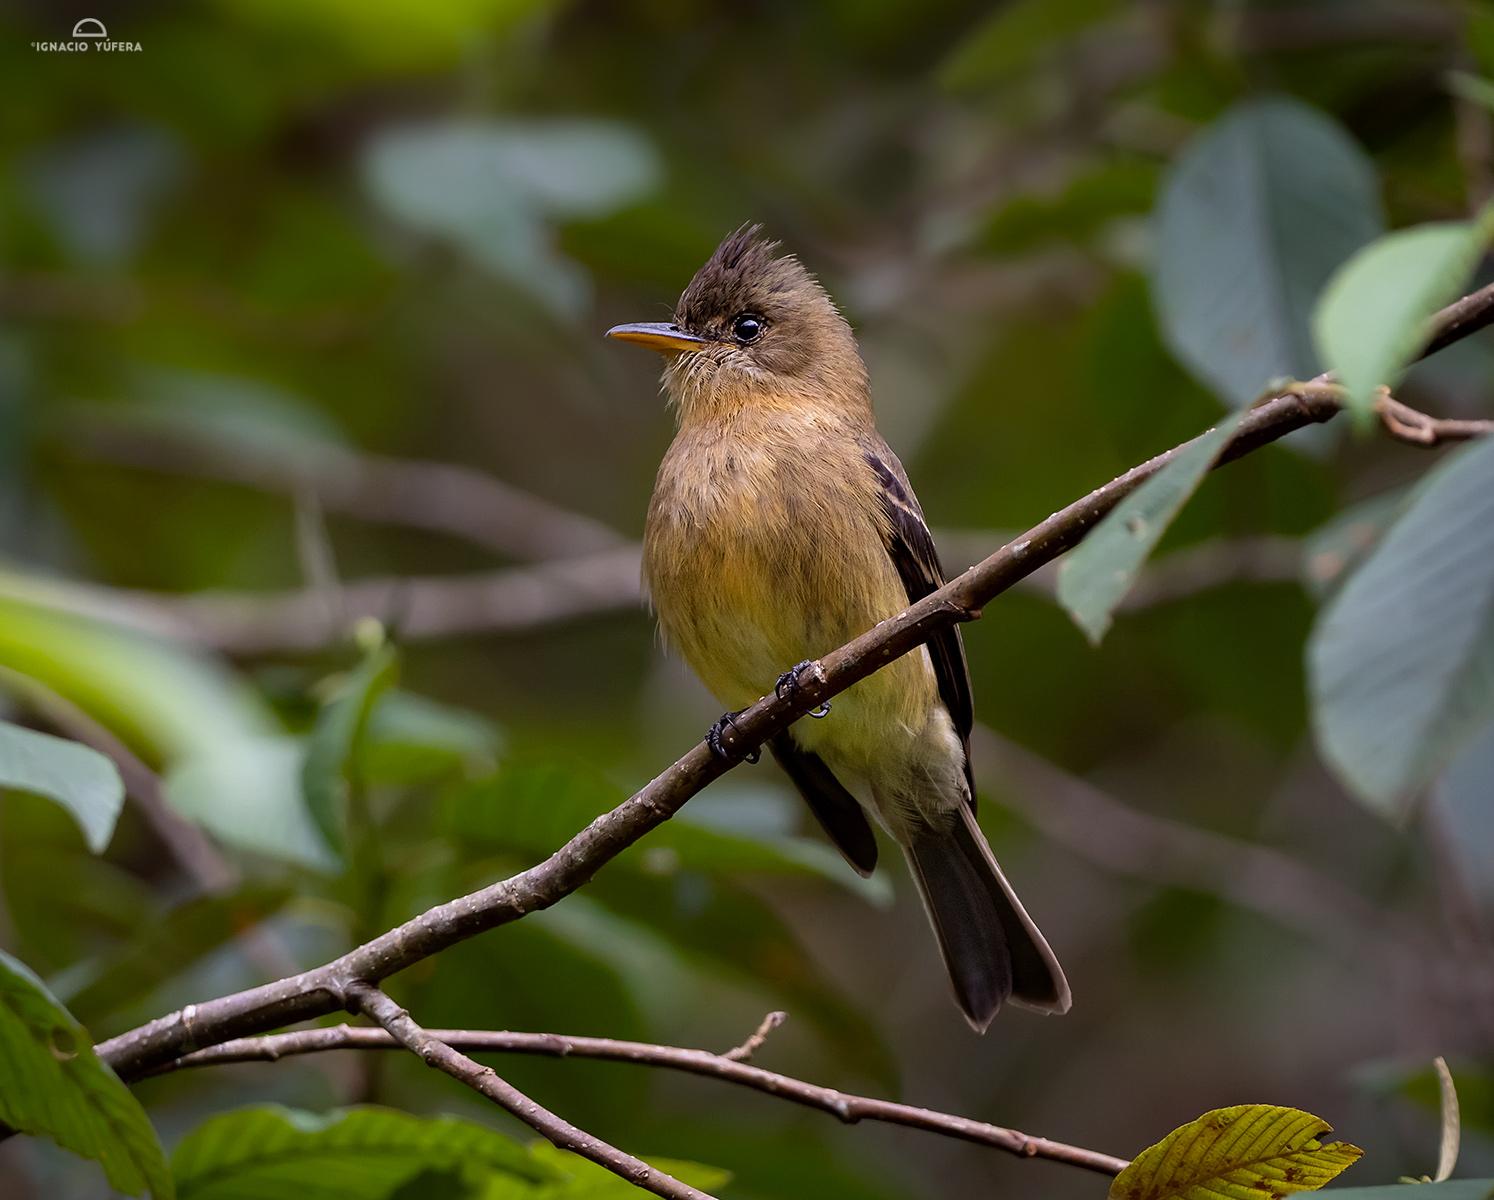 Ochraceous Pewee (Contopus ochraceus), La Amistad National Park, Panama